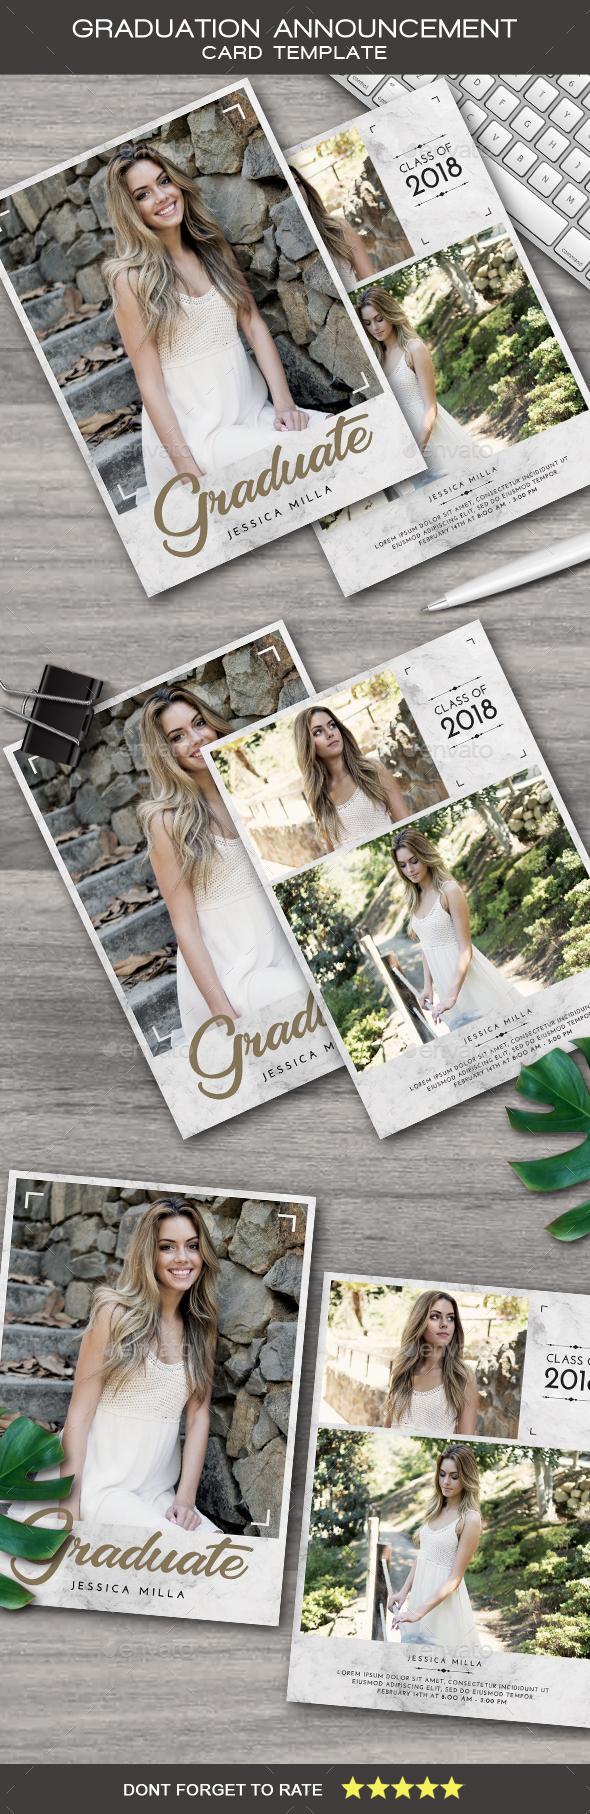 Graduation Announcement Card - Cards & Invites Print Templates